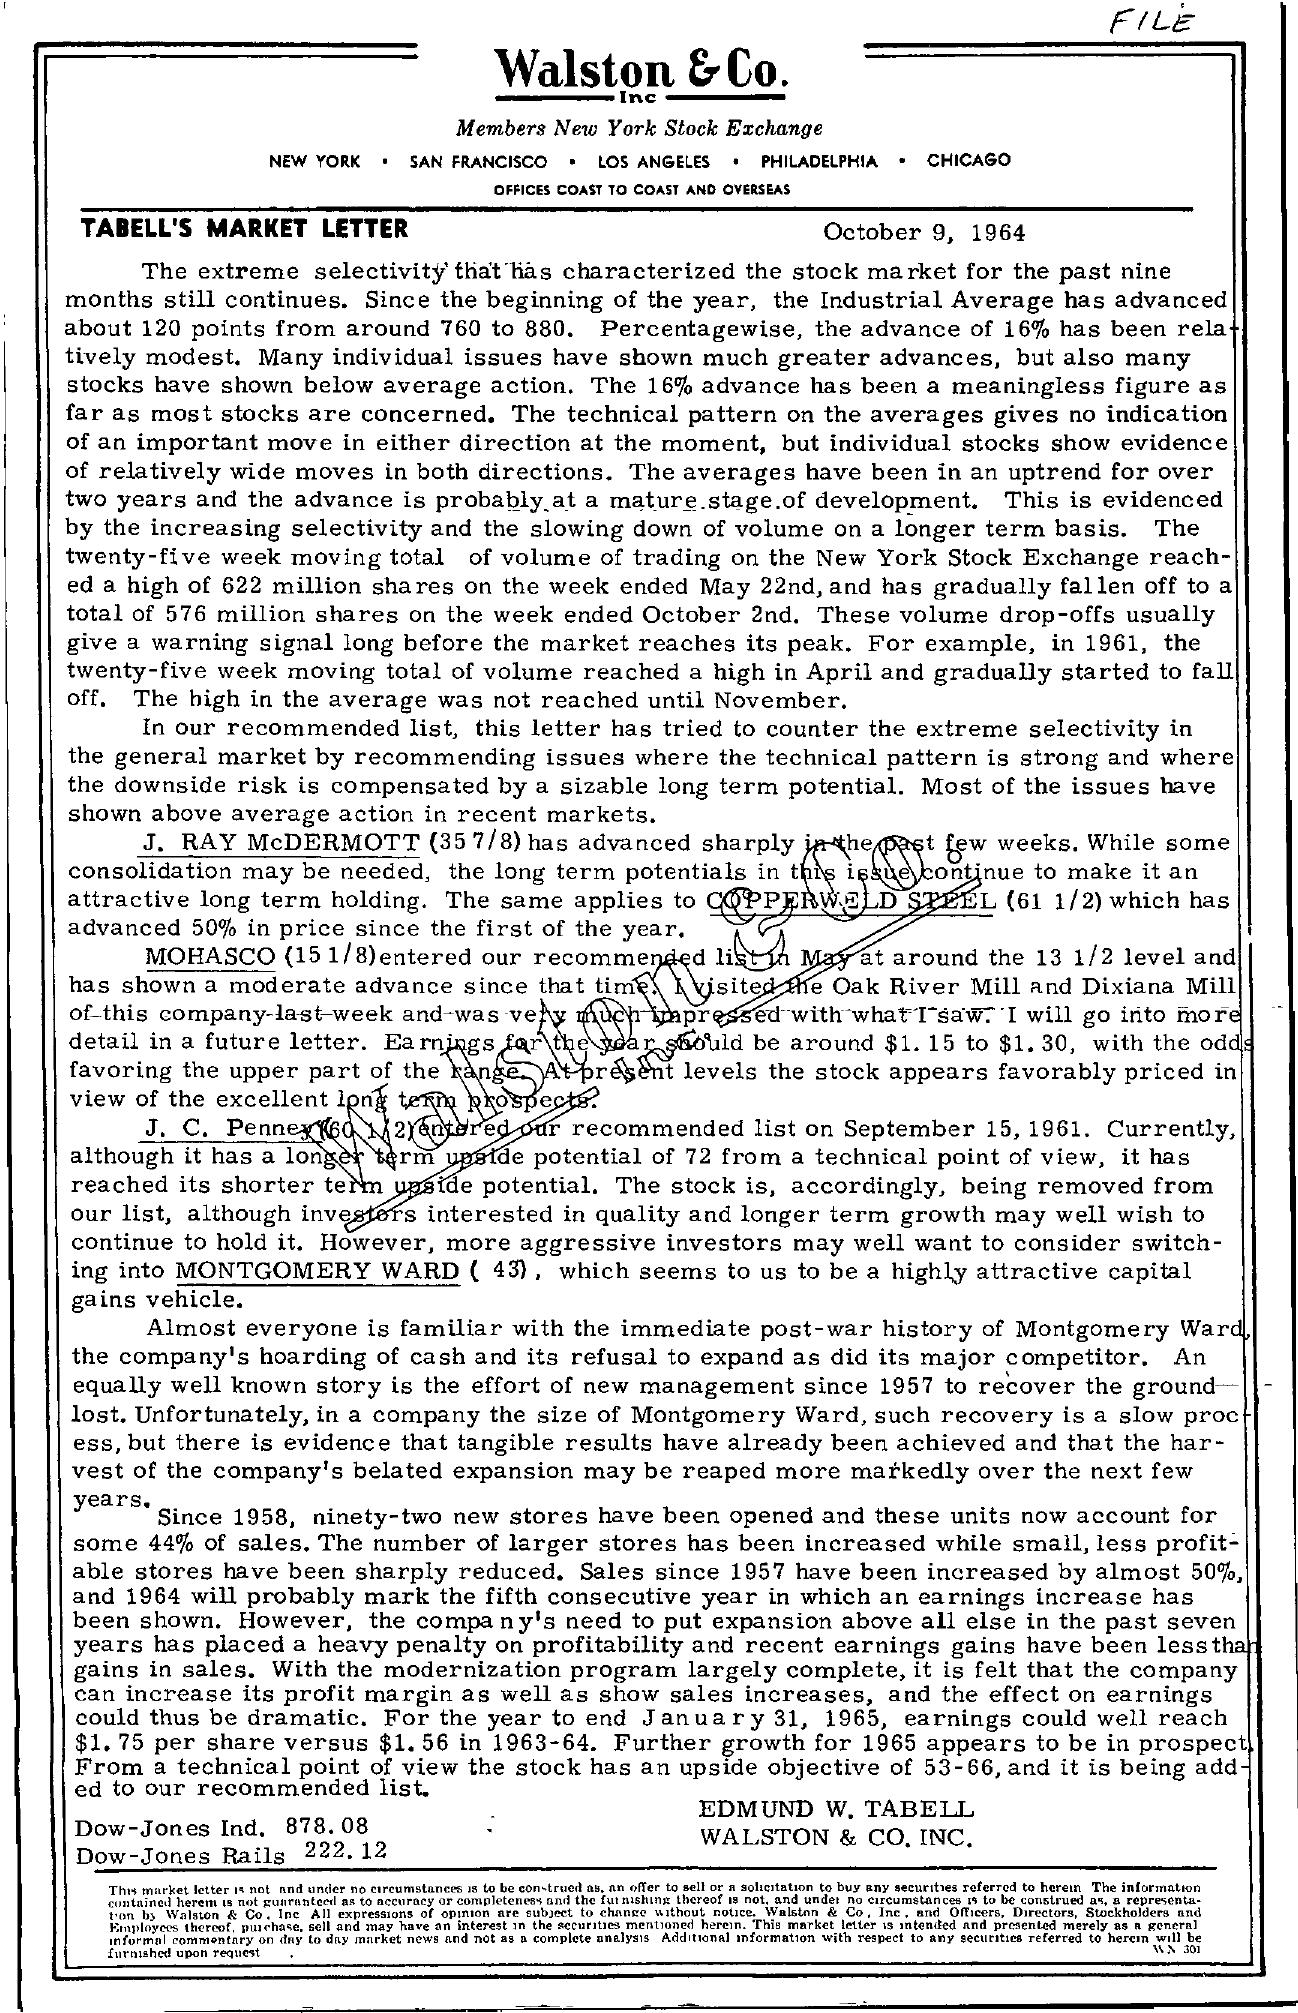 Tabell's Market Letter - October 09, 1964